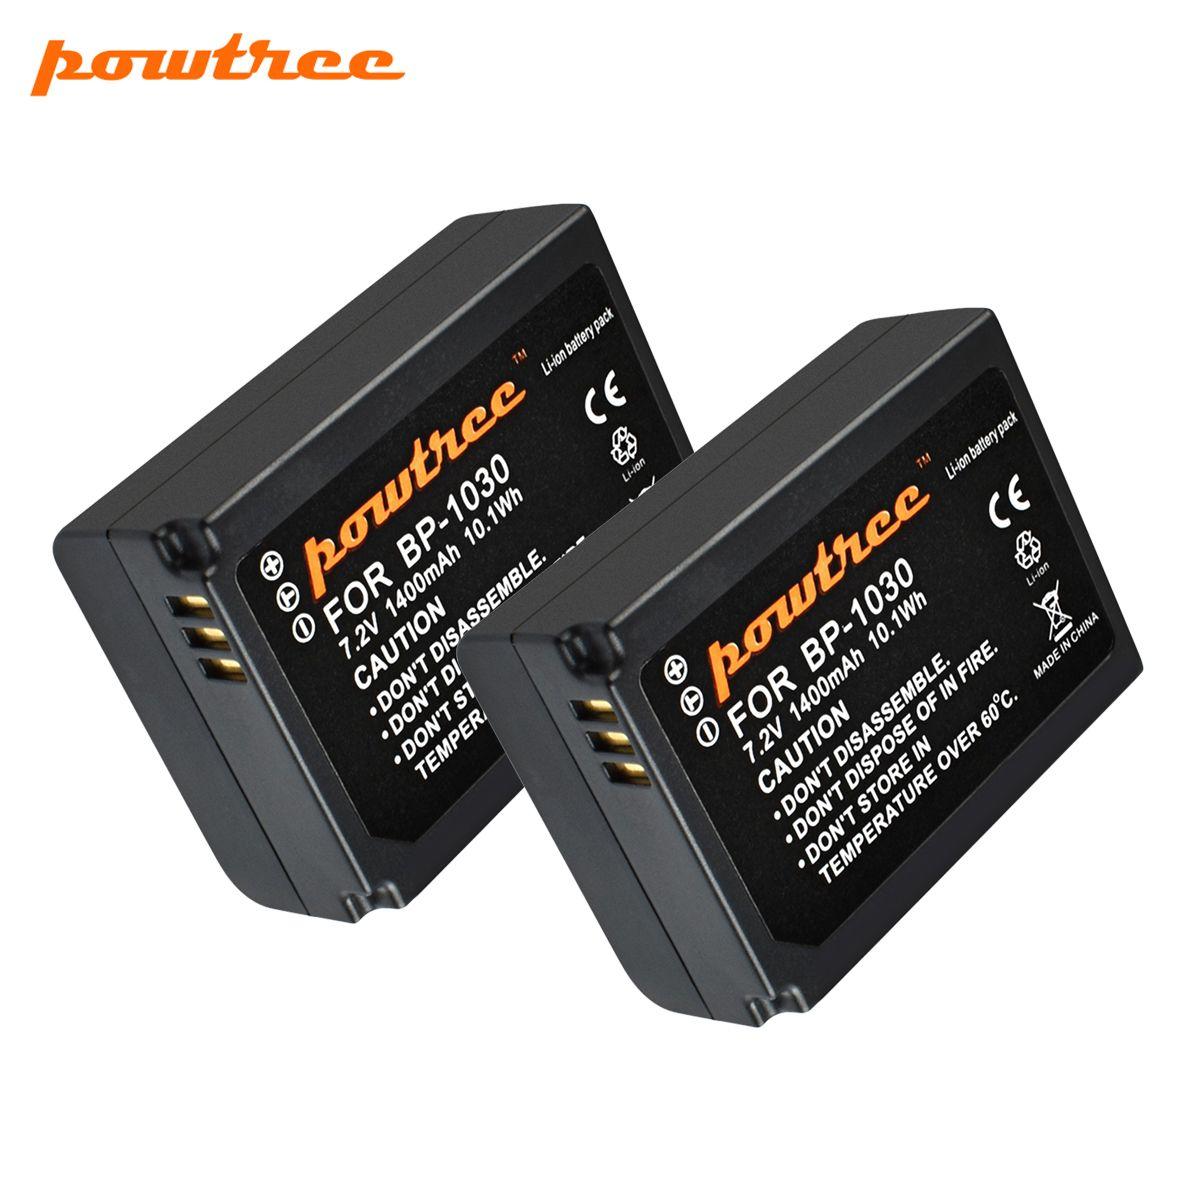 Powtree 7,2 V 1400 mAh BP-1030 BP1030 BP1130 BP-1130 Repalcement Kamera Batterie Für Samsung NX200 Kamera Batterie L10